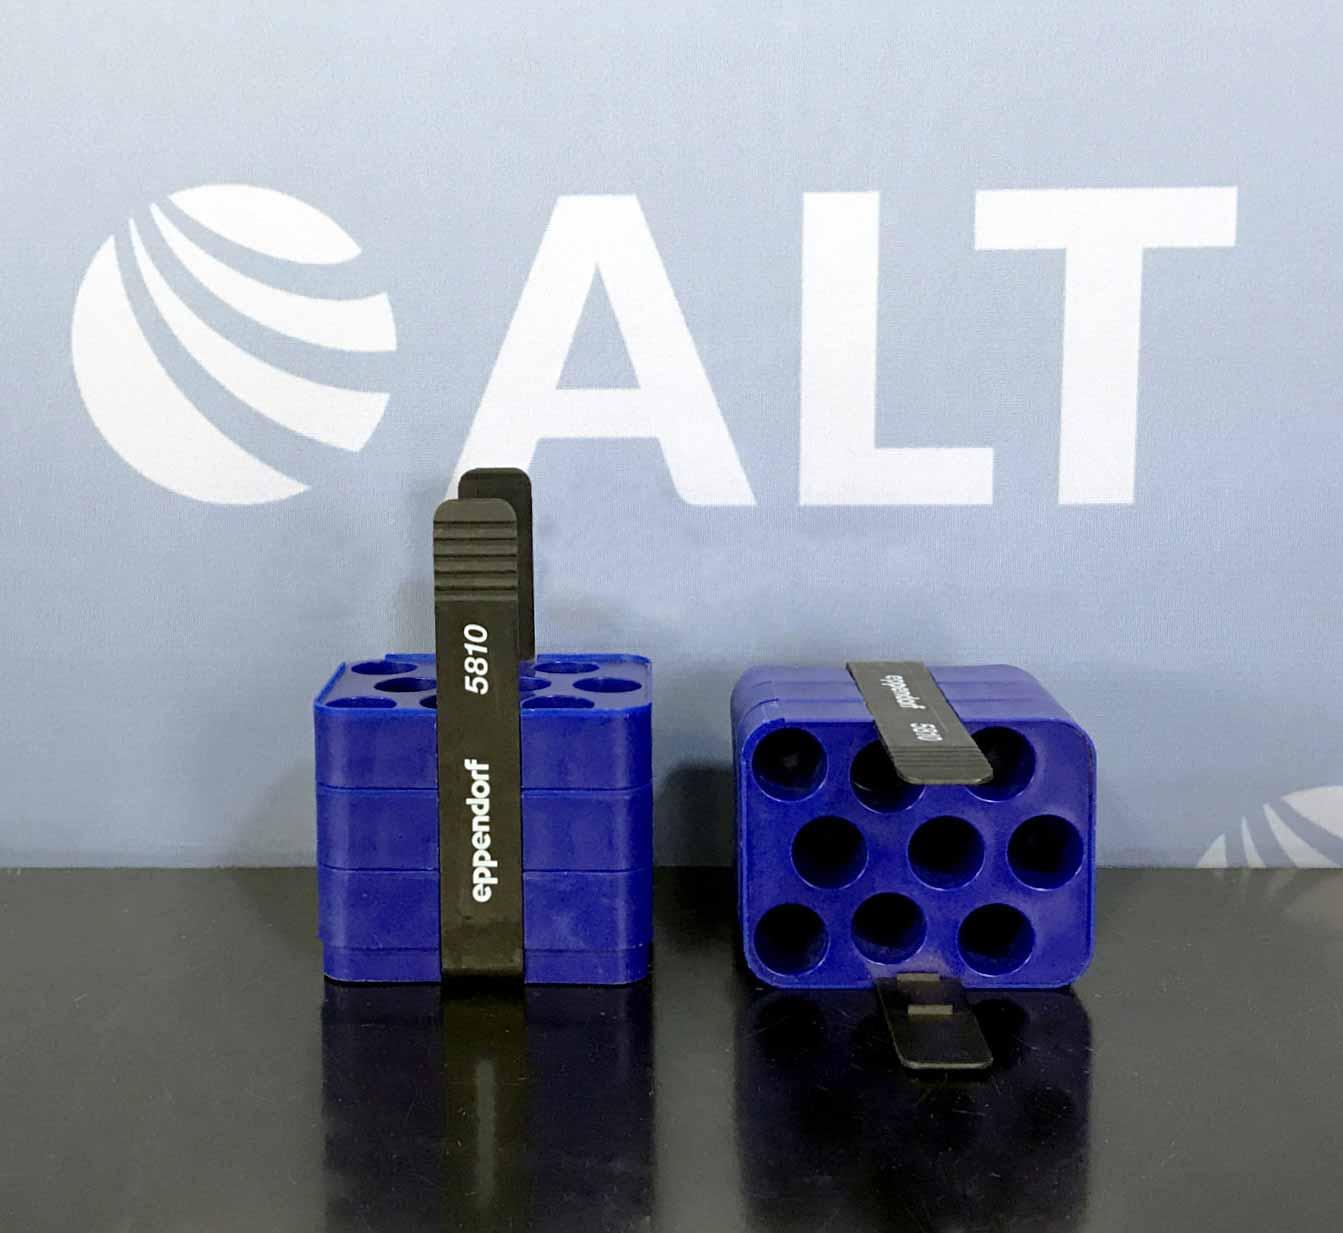 Eppendorf 5810 (9) Tube Slot Adapter for 250 mL Rectangular Bucket. 17.5mm: Conical Bottom (Set of 2) Image